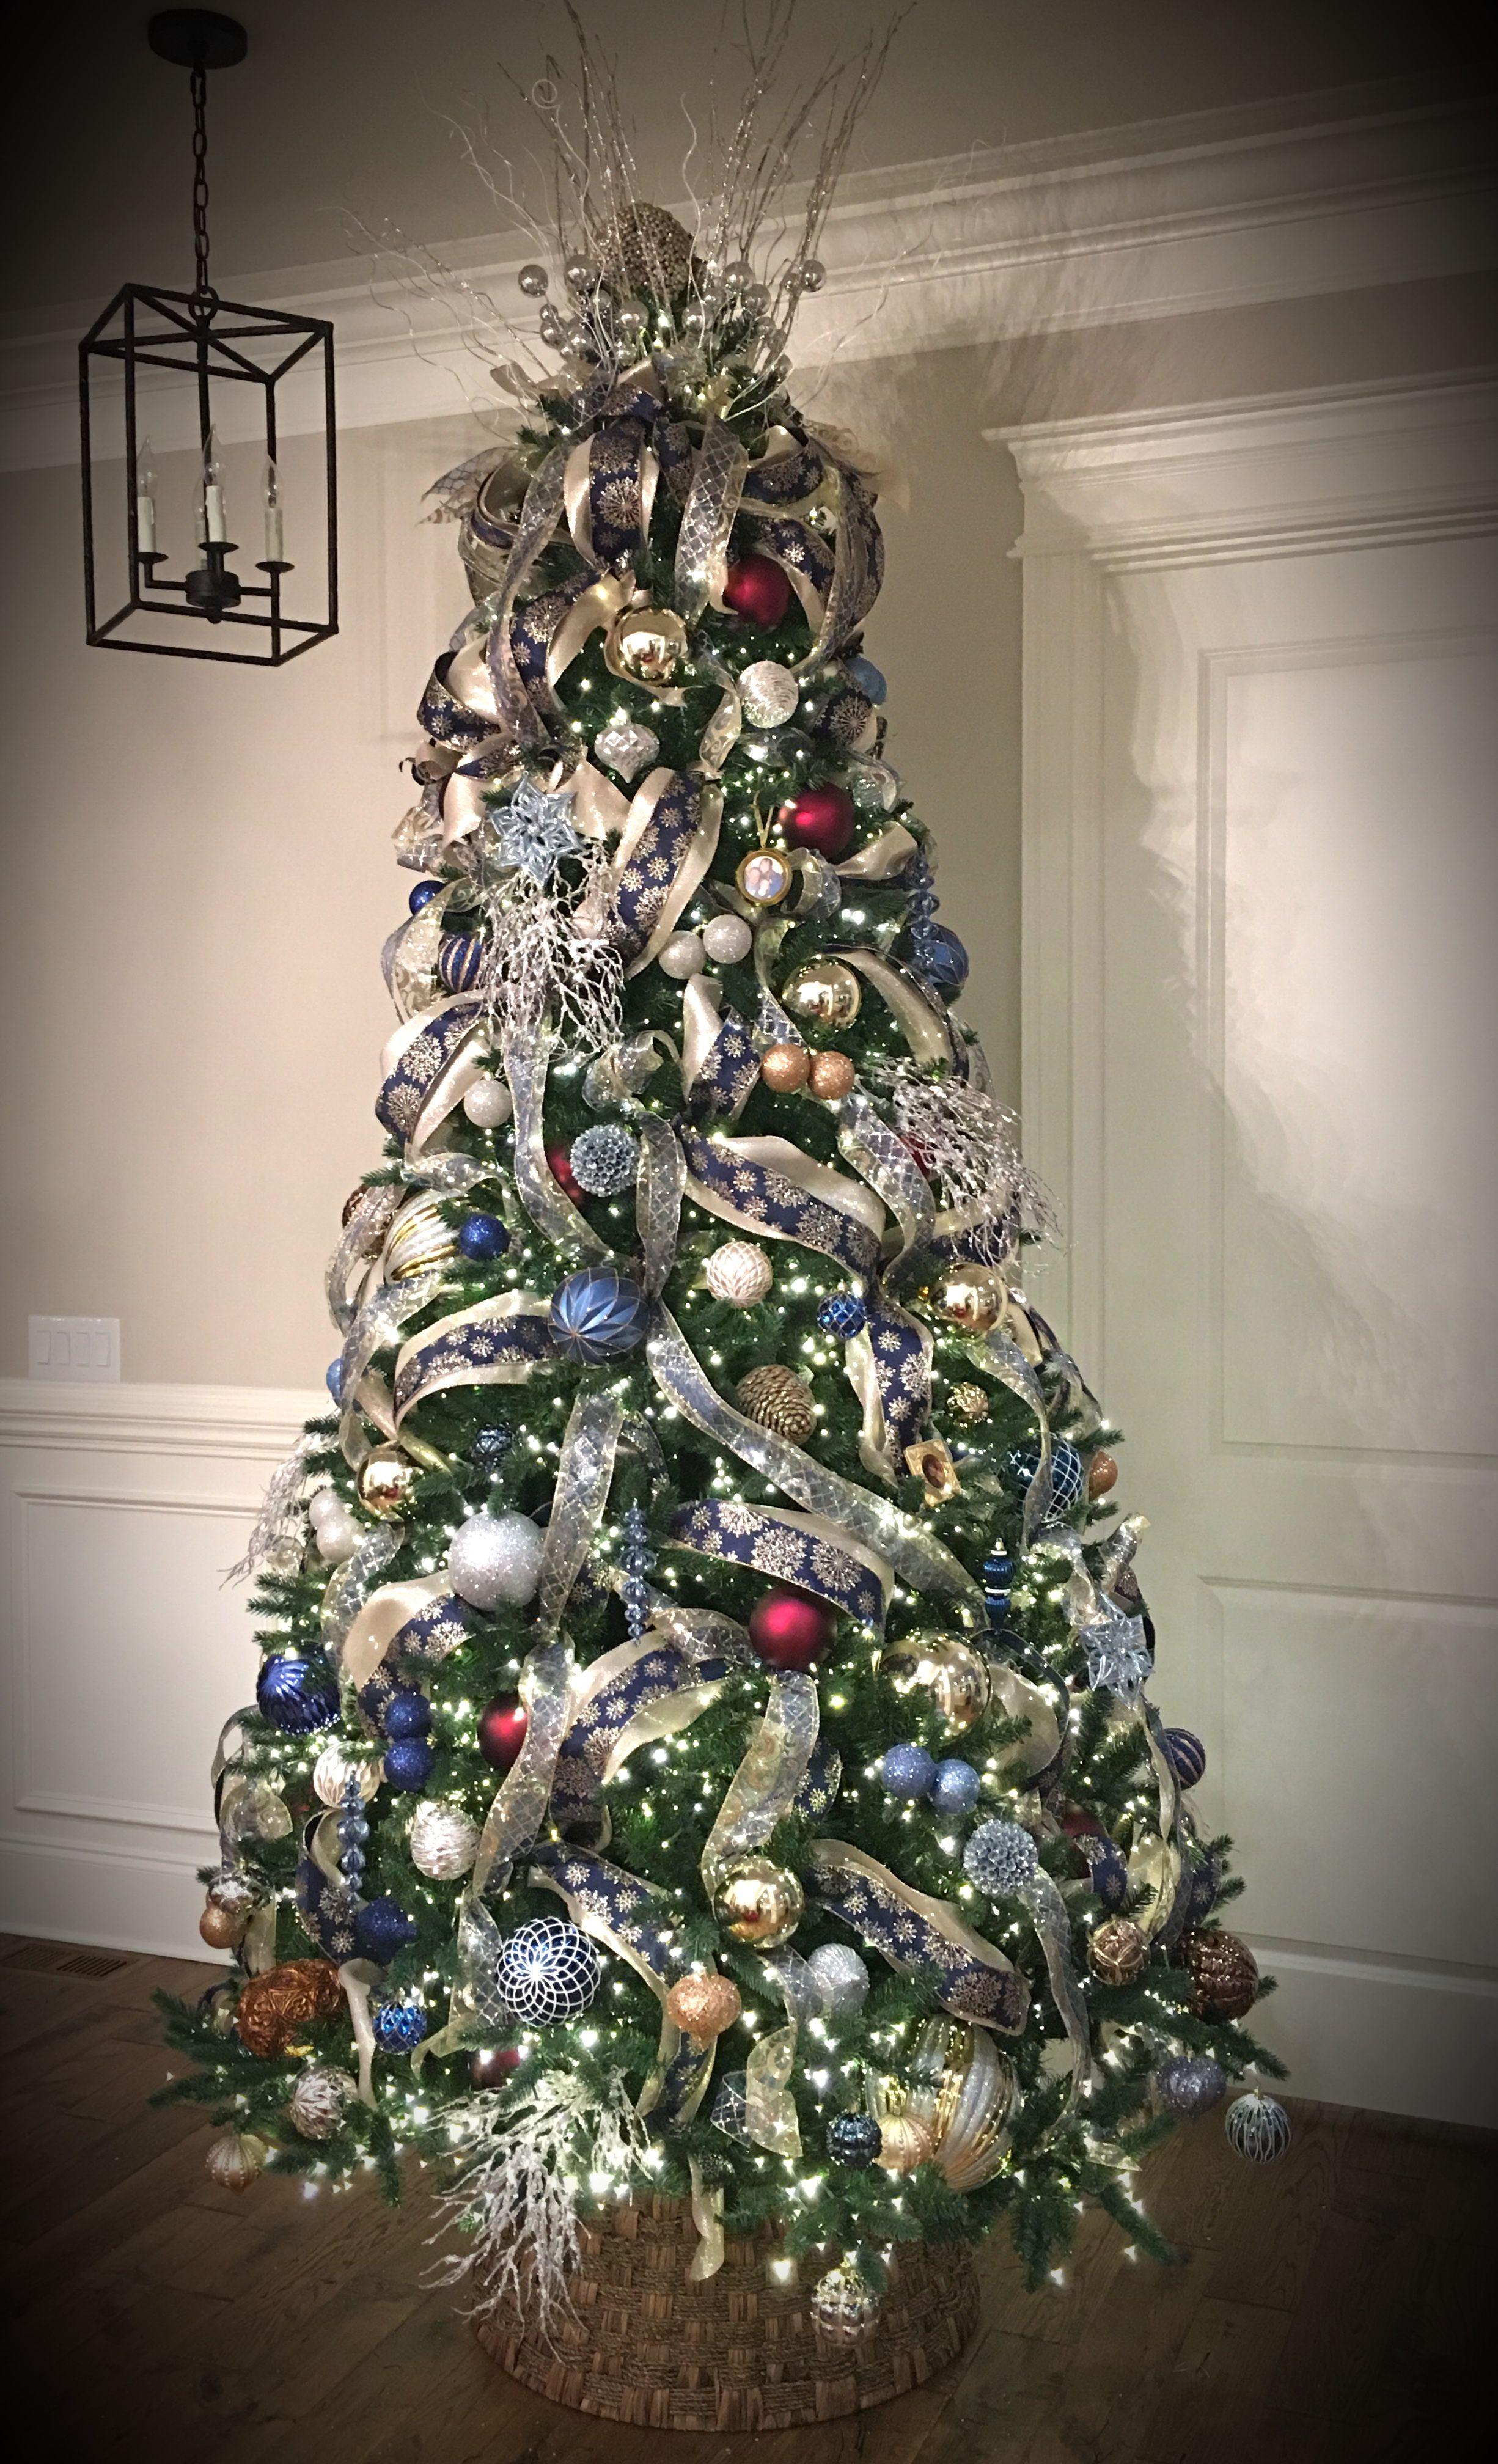 Santa's Best Christmas tree 9'. White lights on champagne